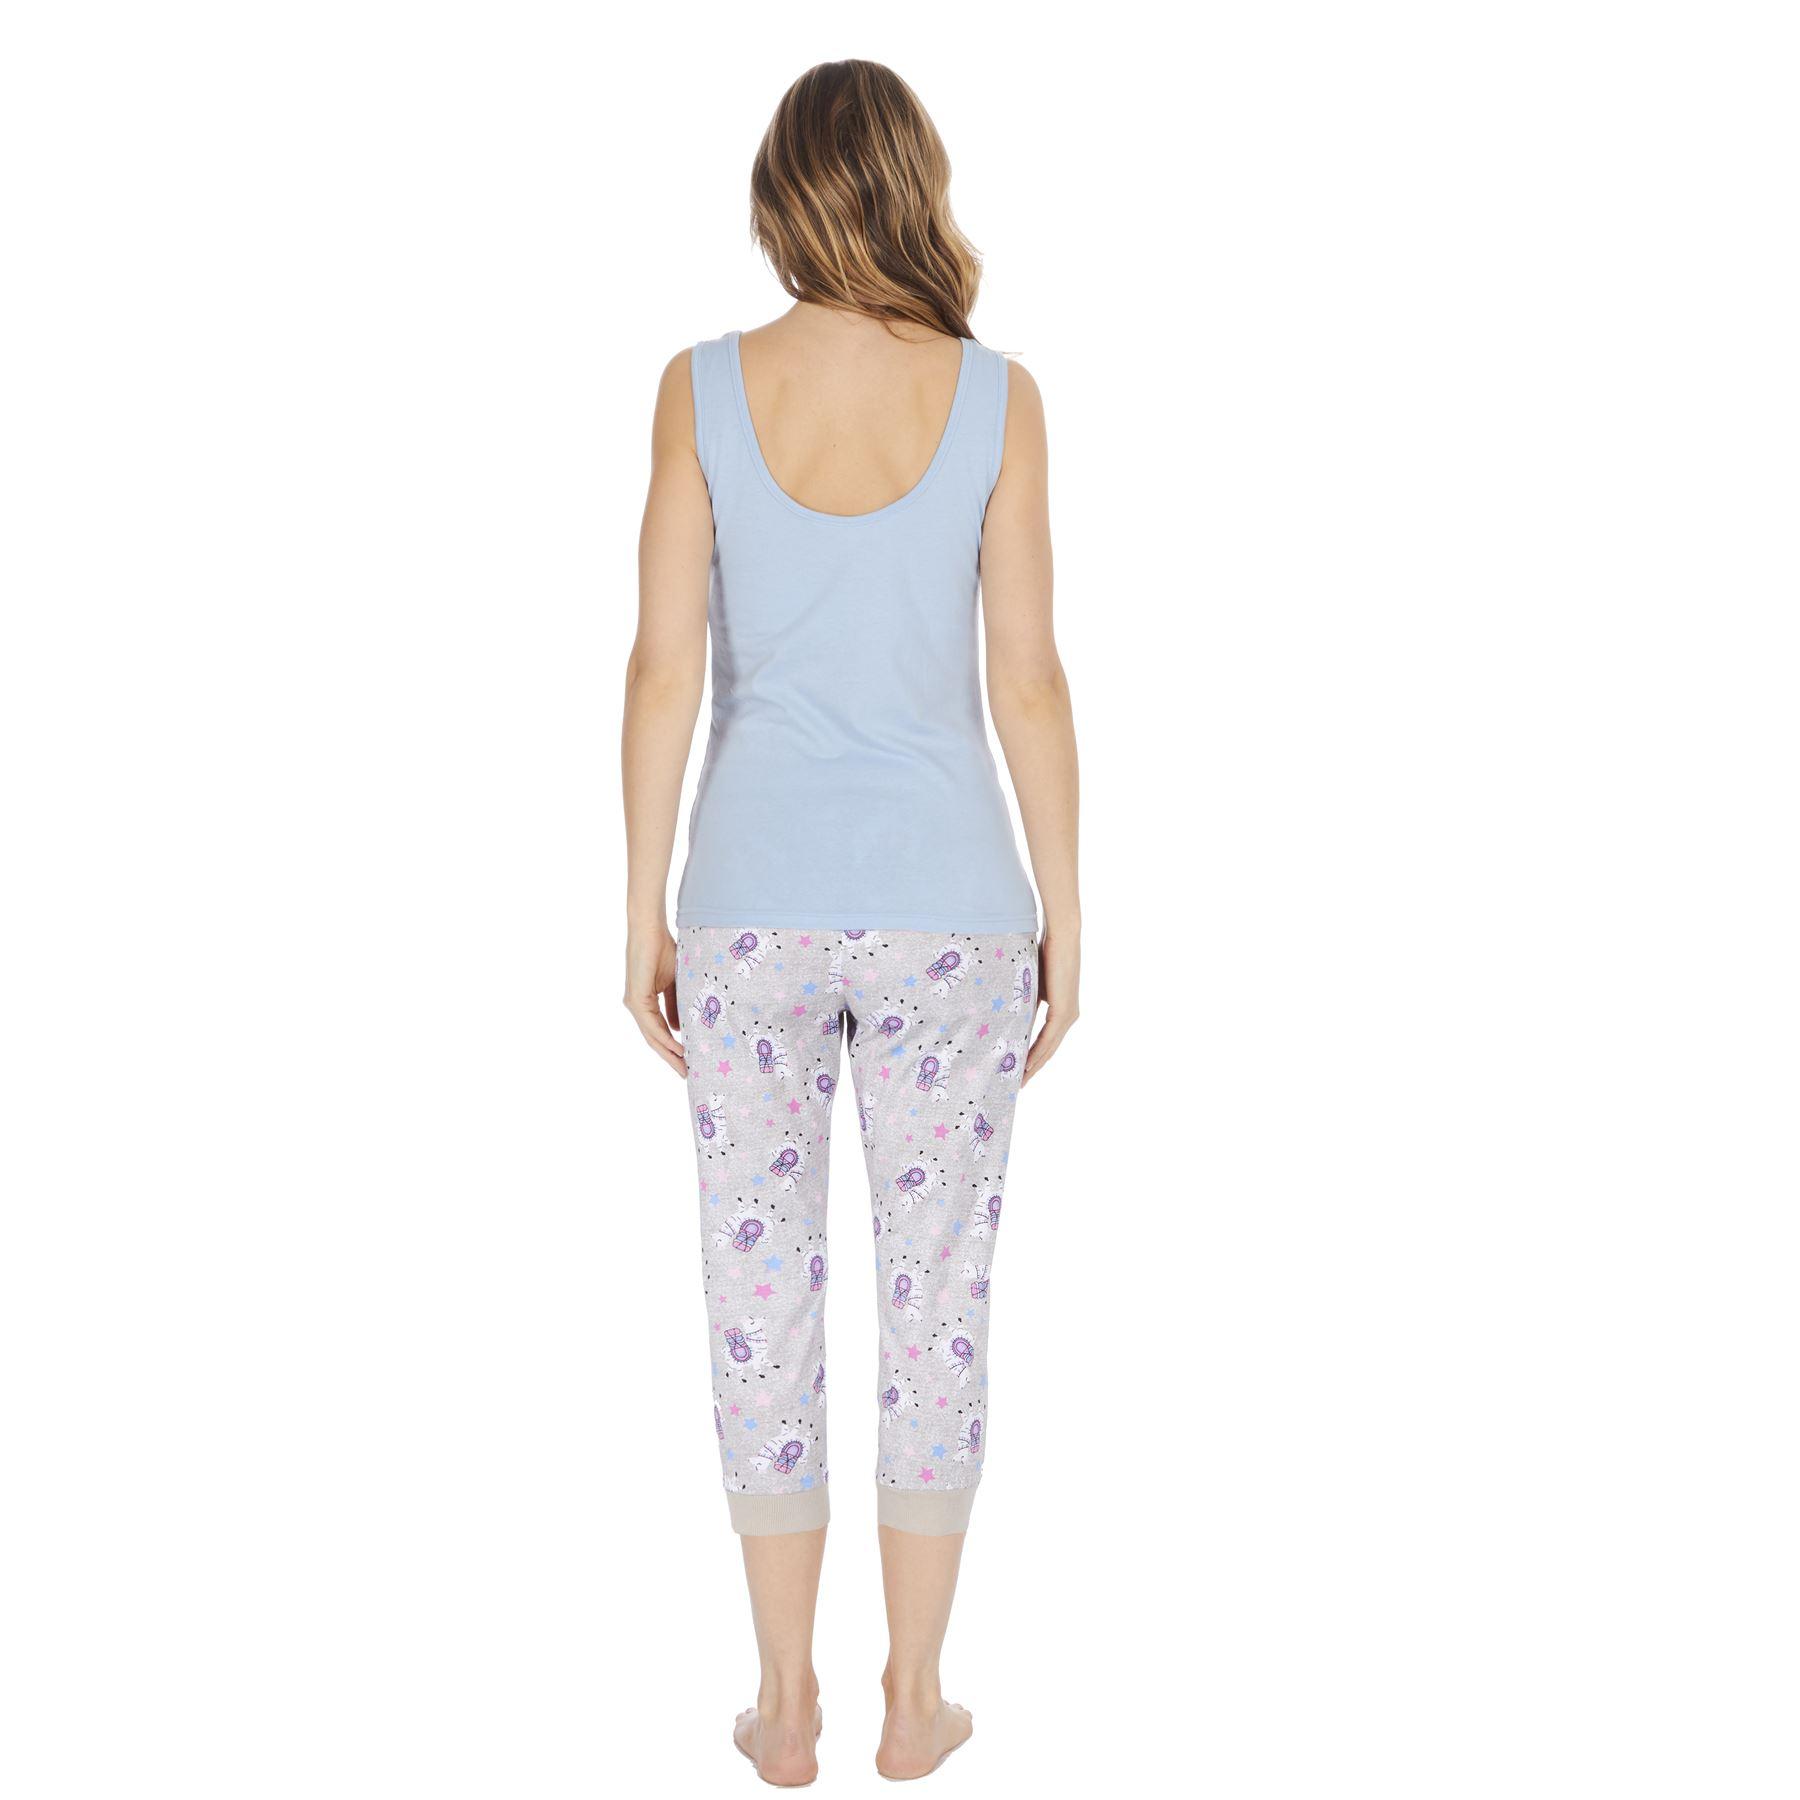 Womens-Ladies-Cotton-Pyjamas-Pyjama-PJs-Summer-Nightwear-Set-Size-8-18-NEW thumbnail 19